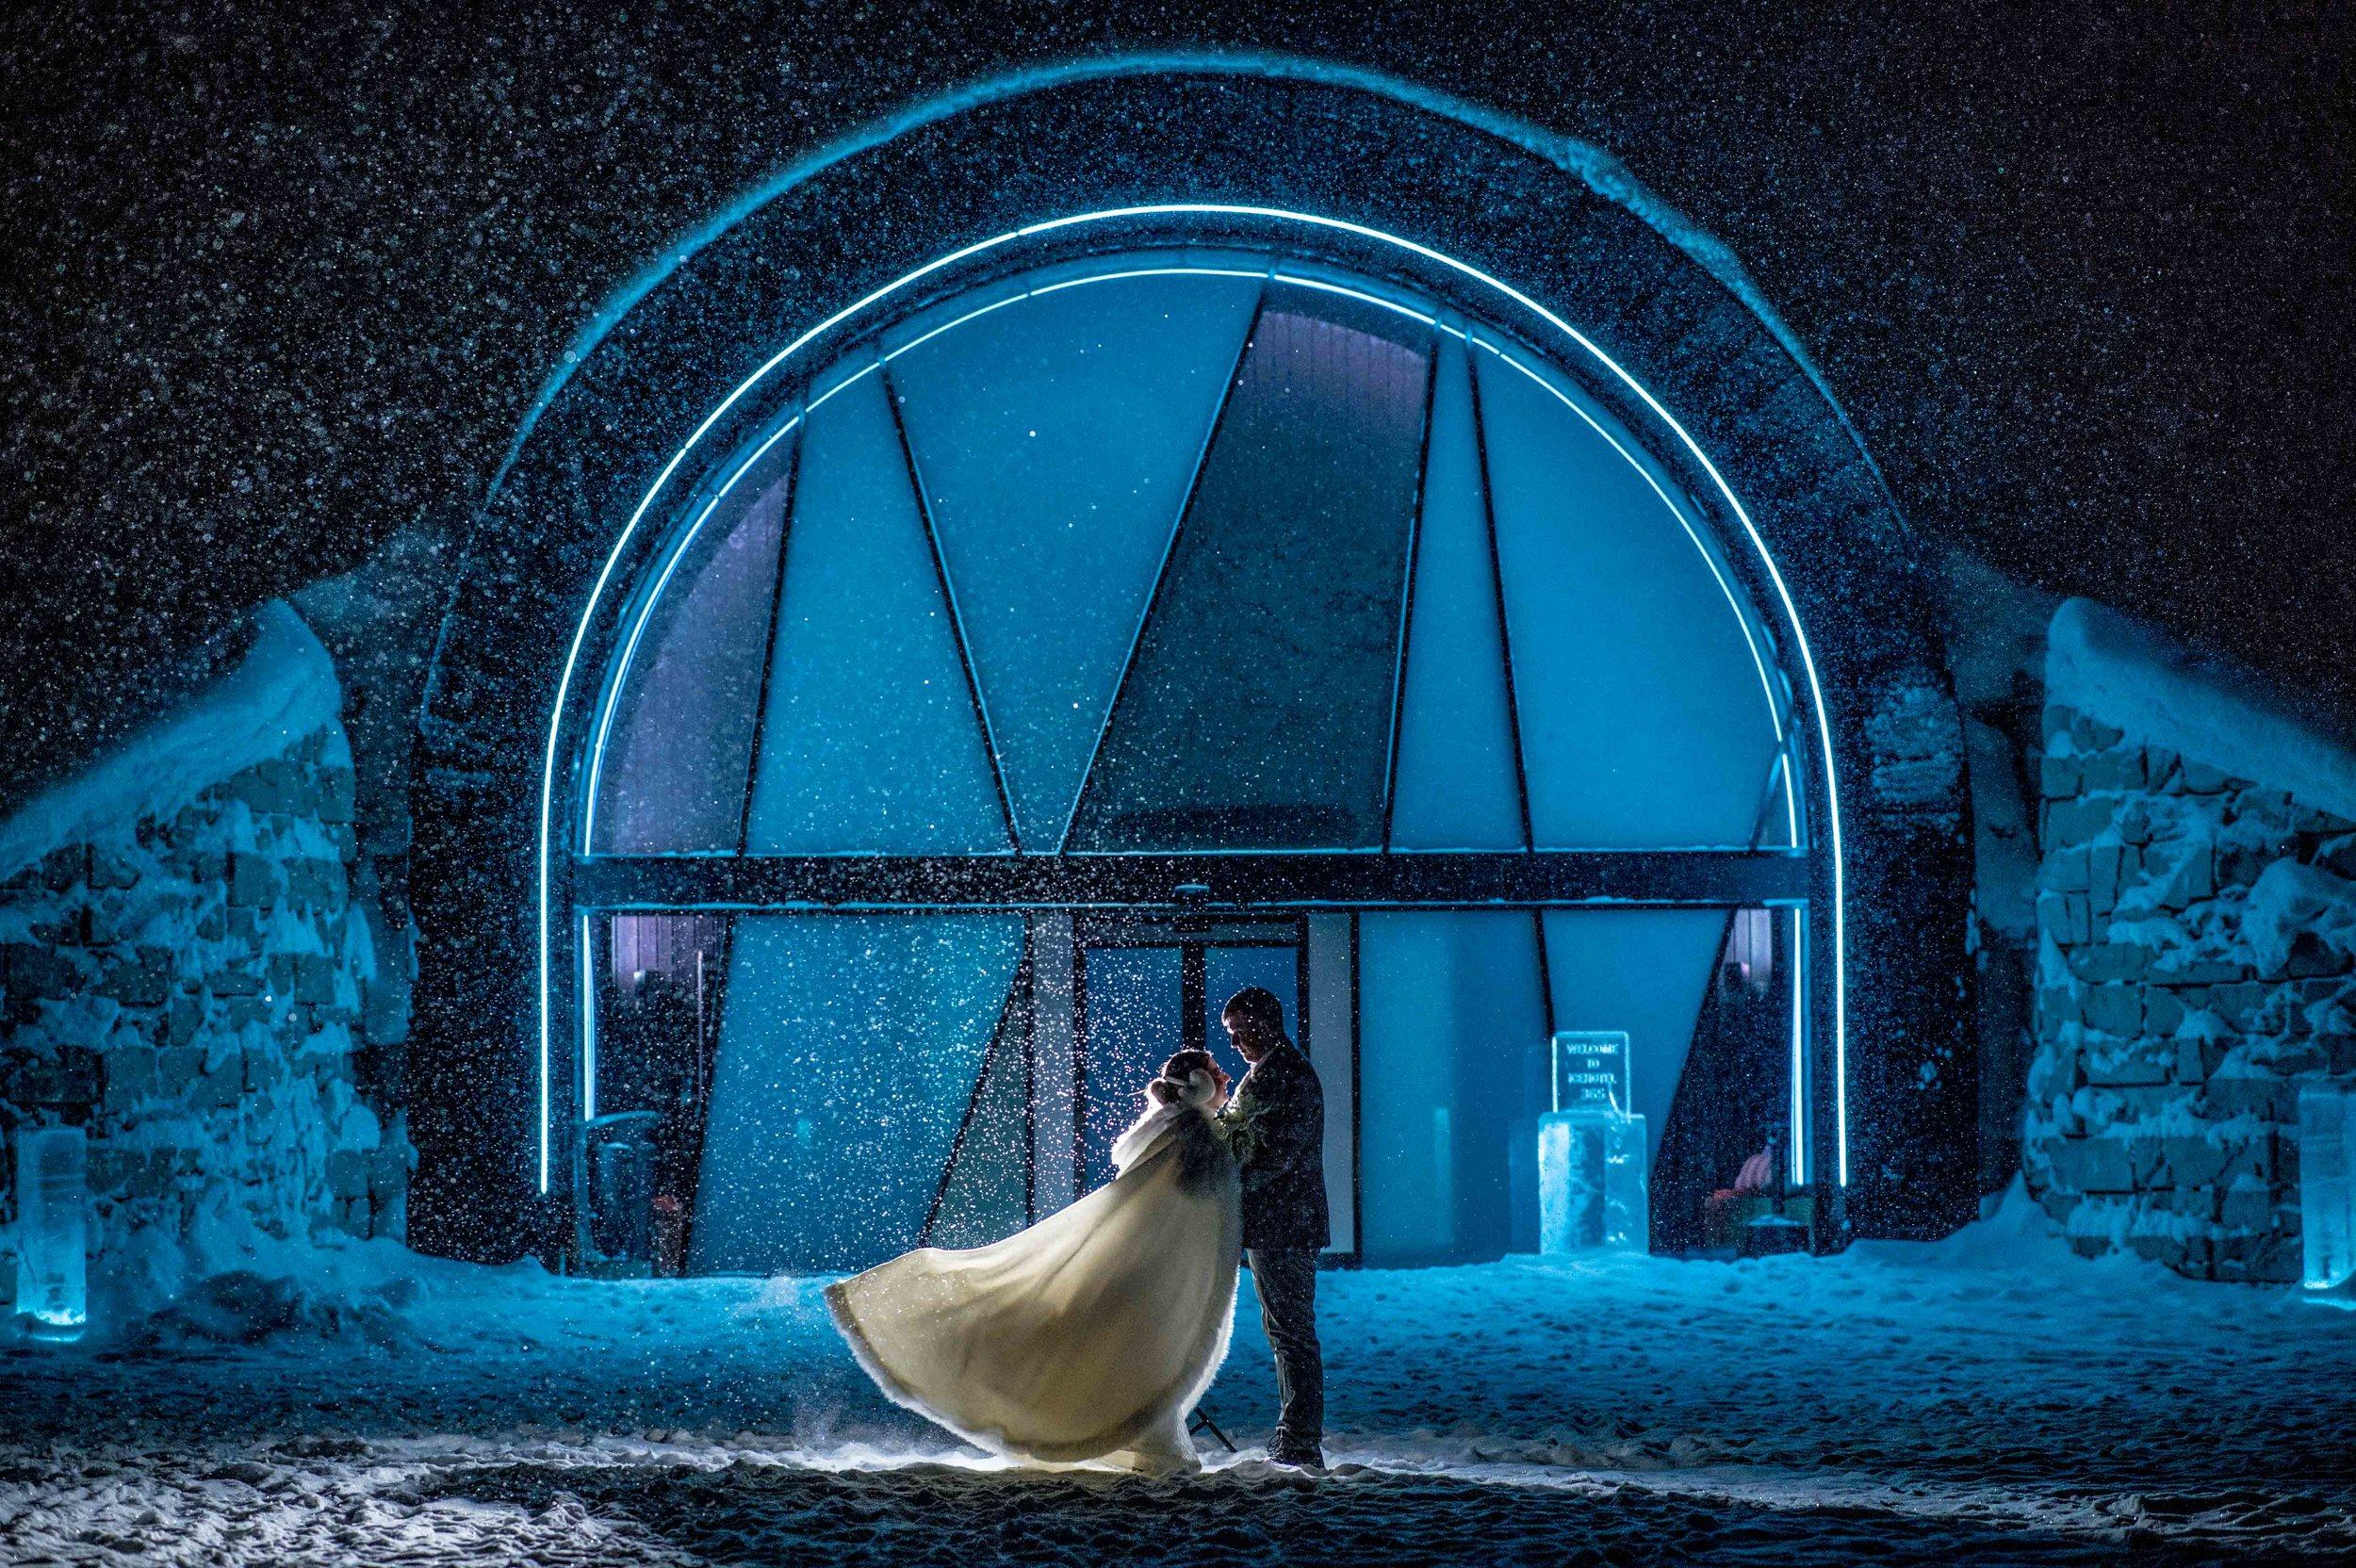 H&S - ICEHOTEL wedding - Asaf Kliger (13 of 13).jpg